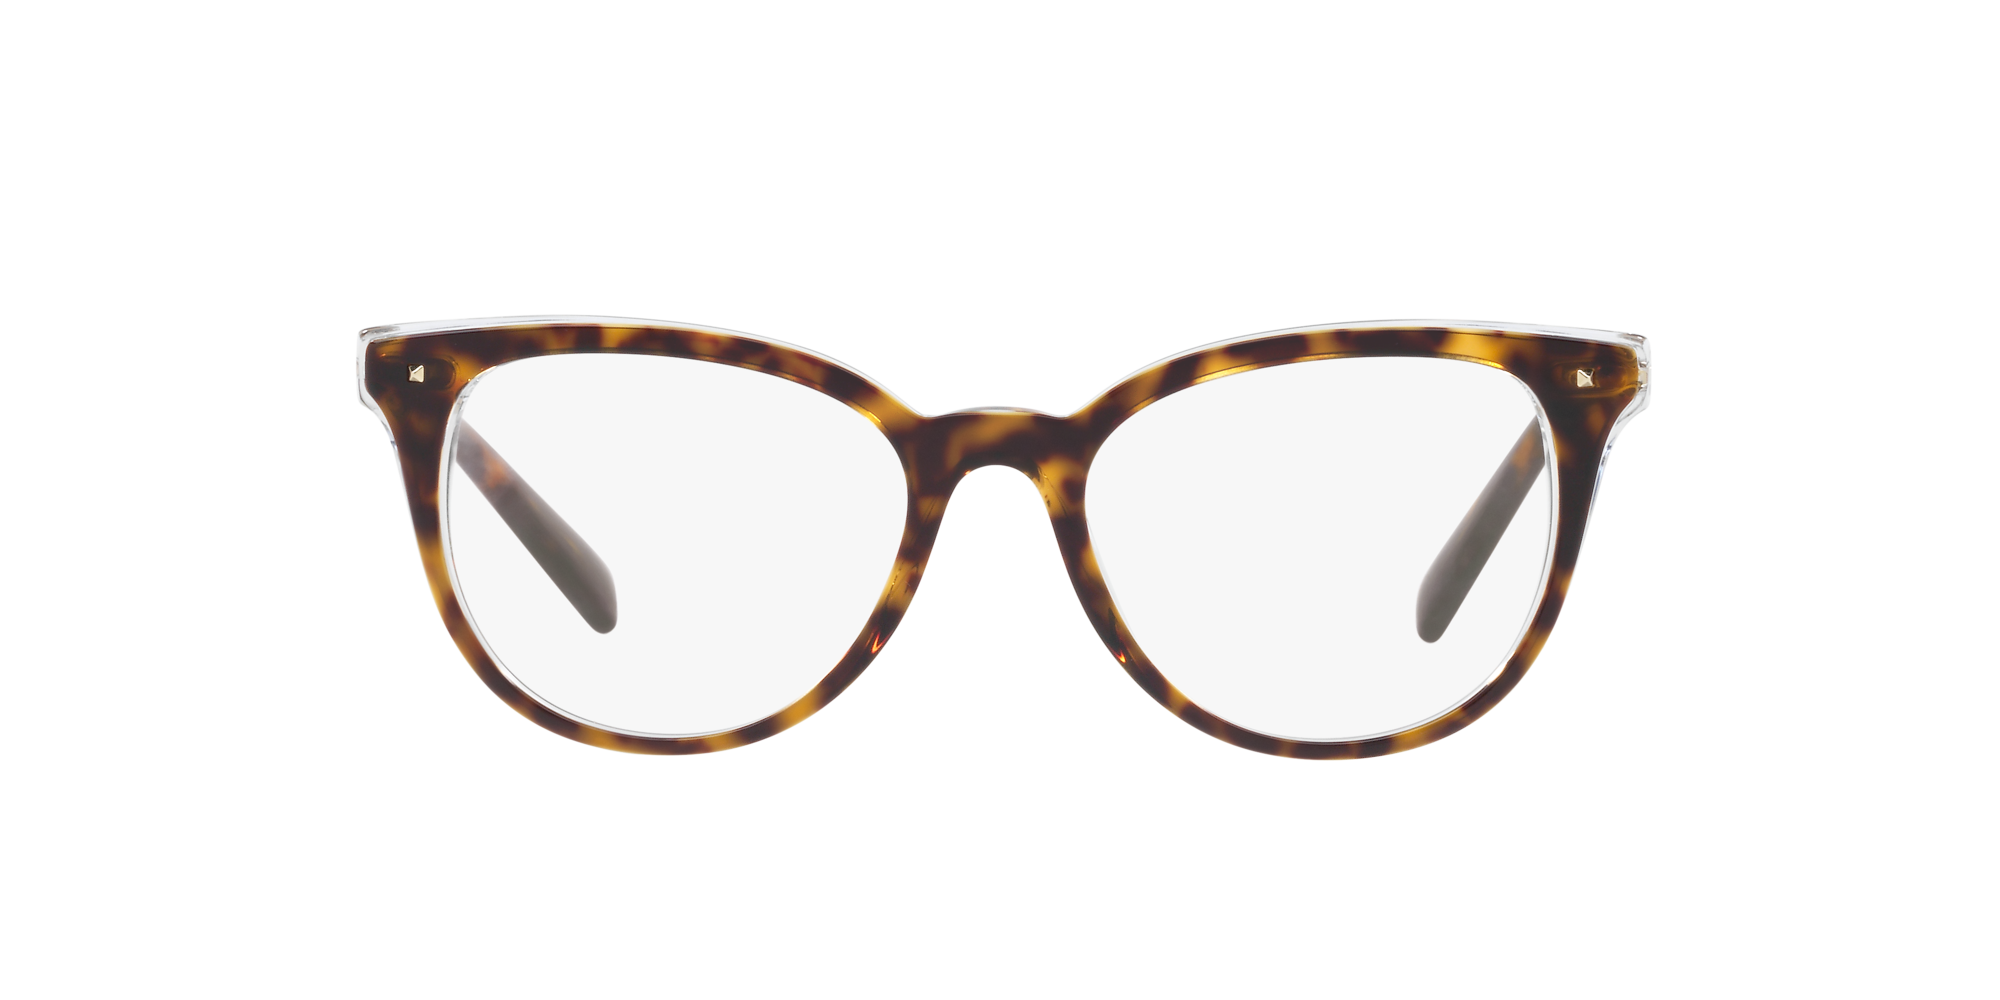 Image for VA3005 from LensCrafters | Glasses, Prescription Glasses Online, Eyewear